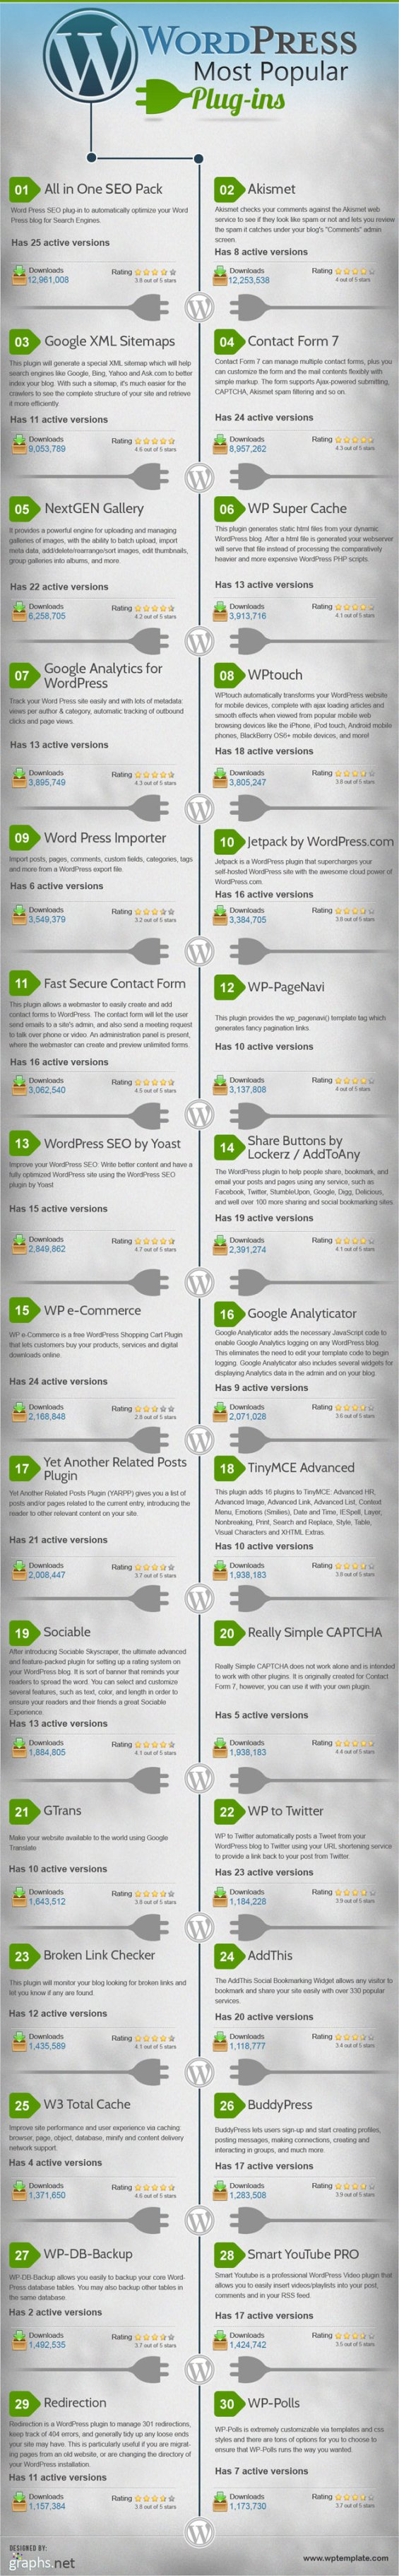 30 populäre WordPress-Plugins